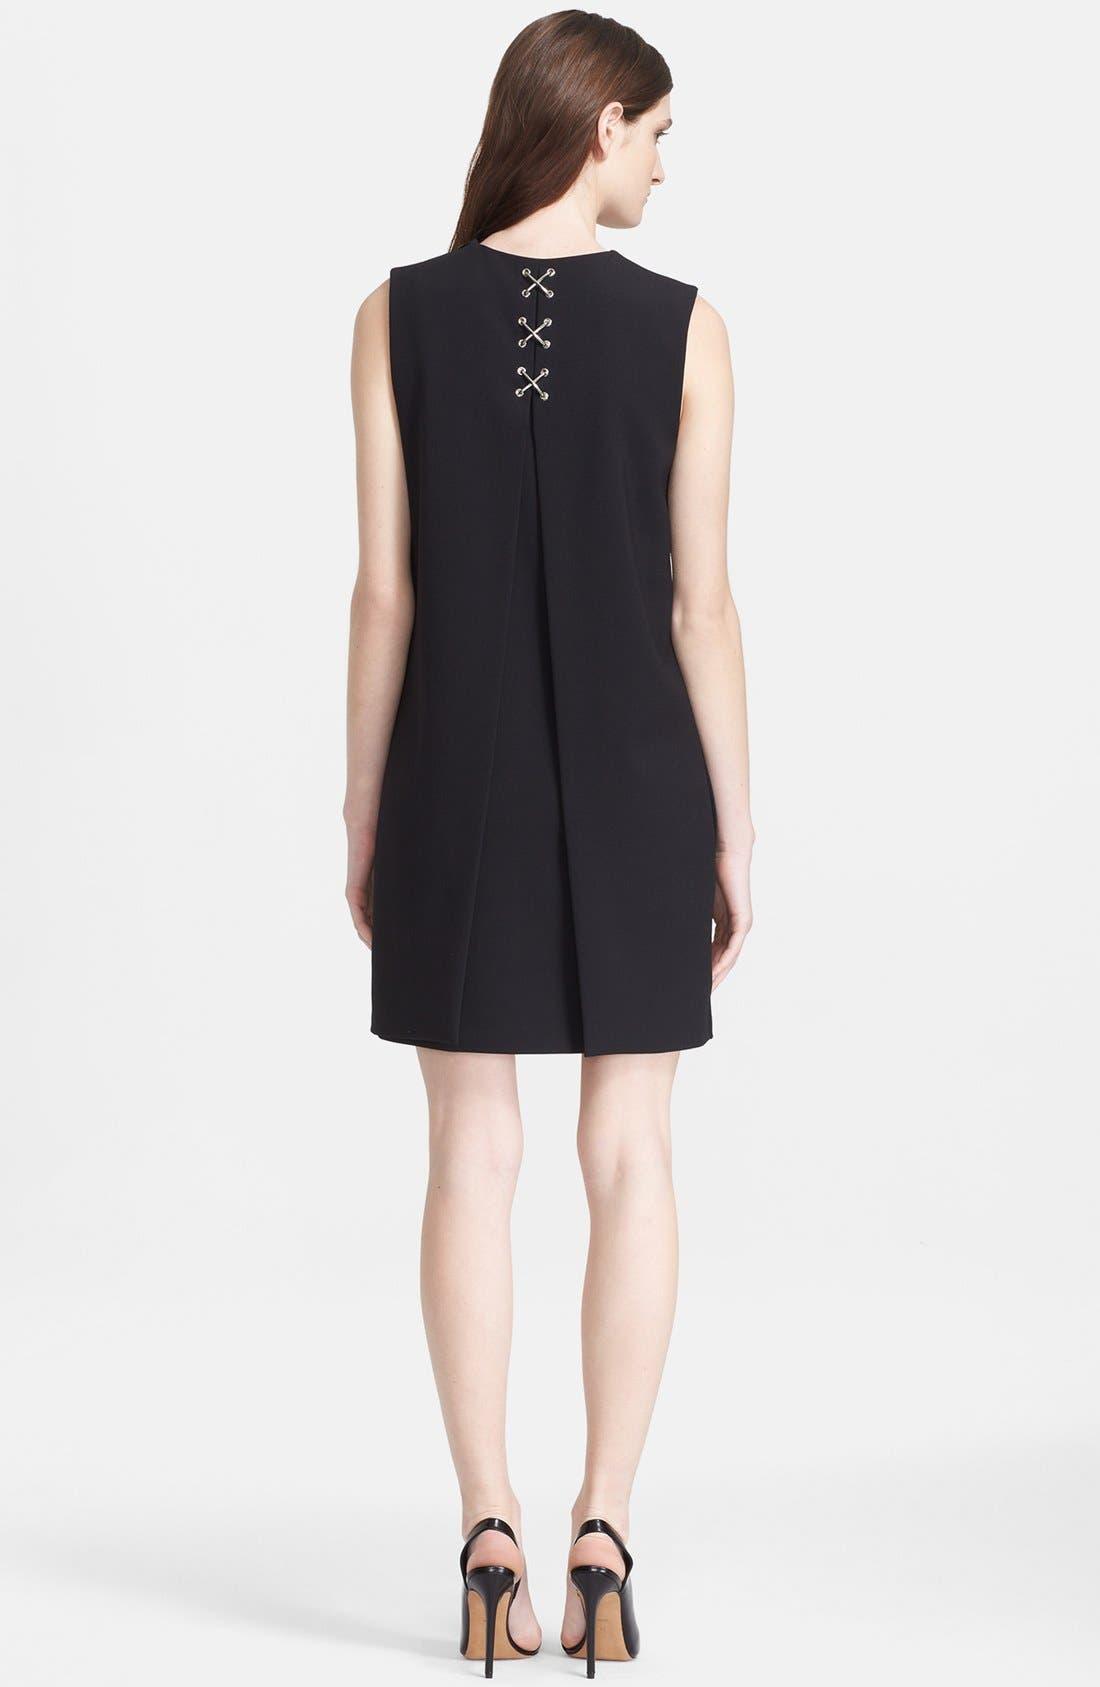 Main Image - Alexander Wang Lace-Up Back Folded Dress